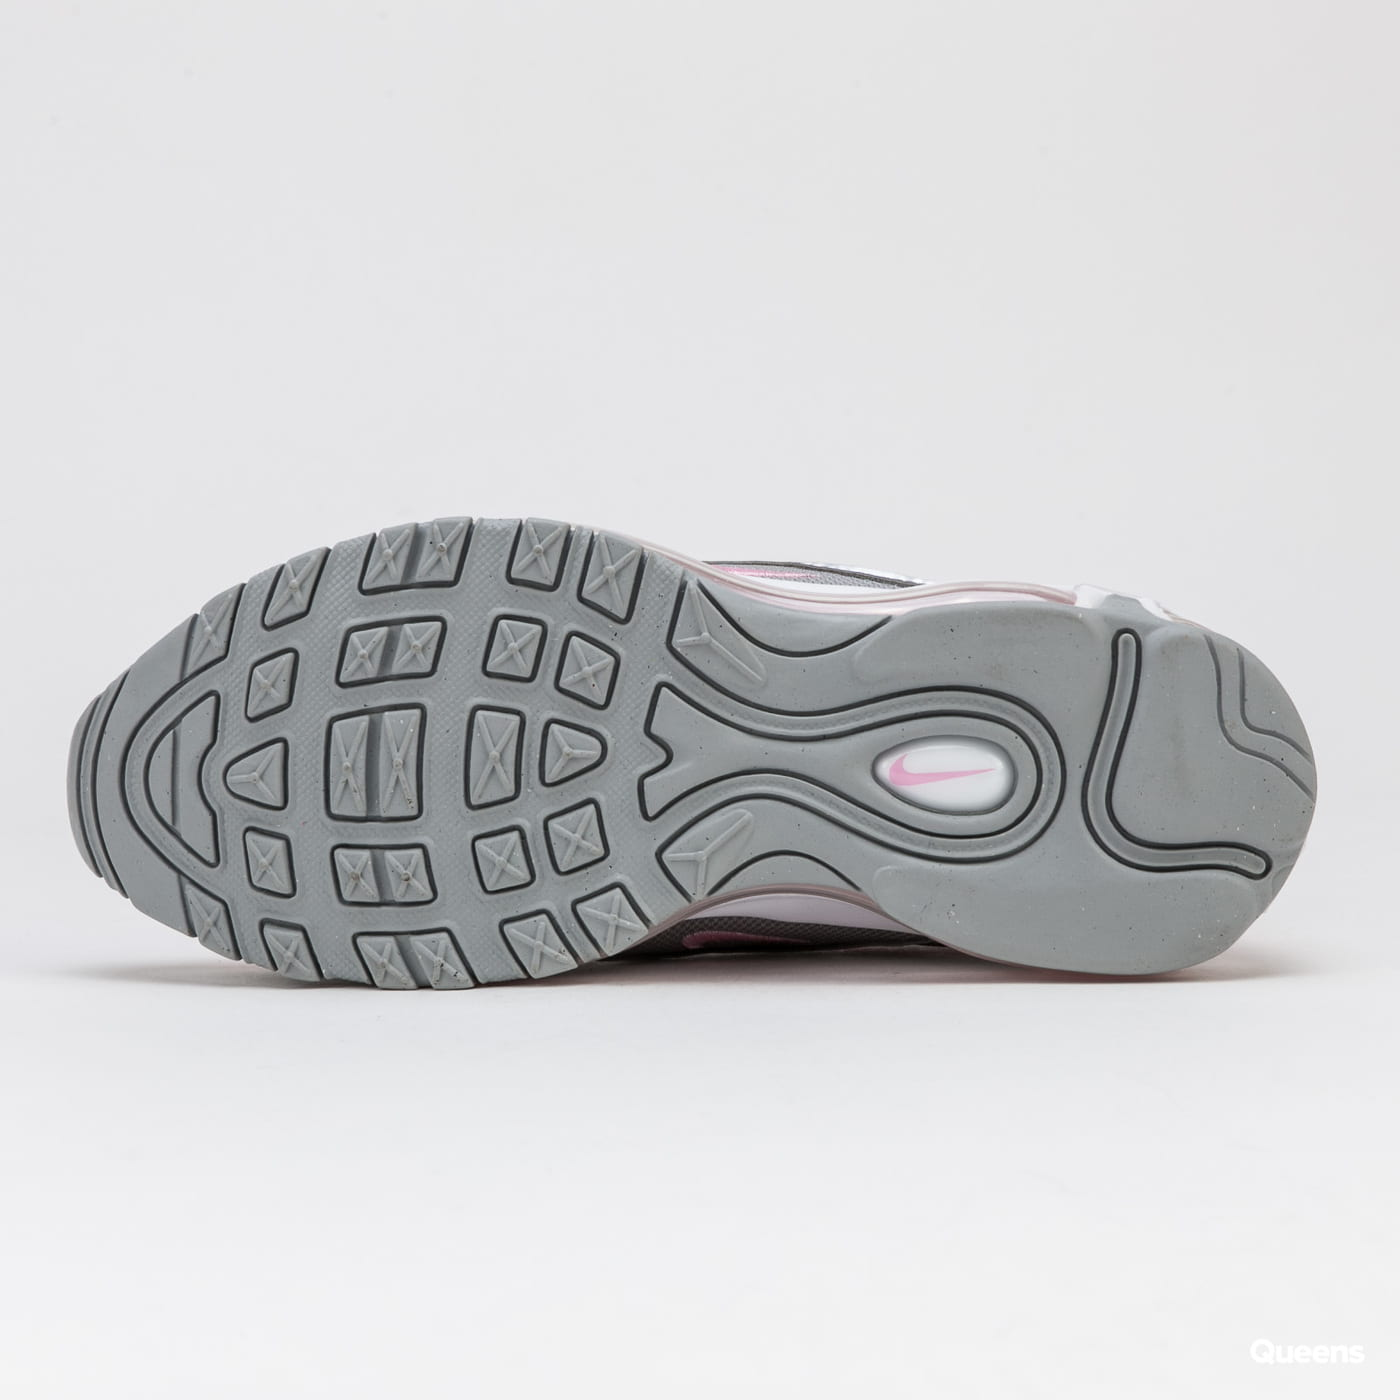 Nike Air Max 97 (GS) metalic silver / pink